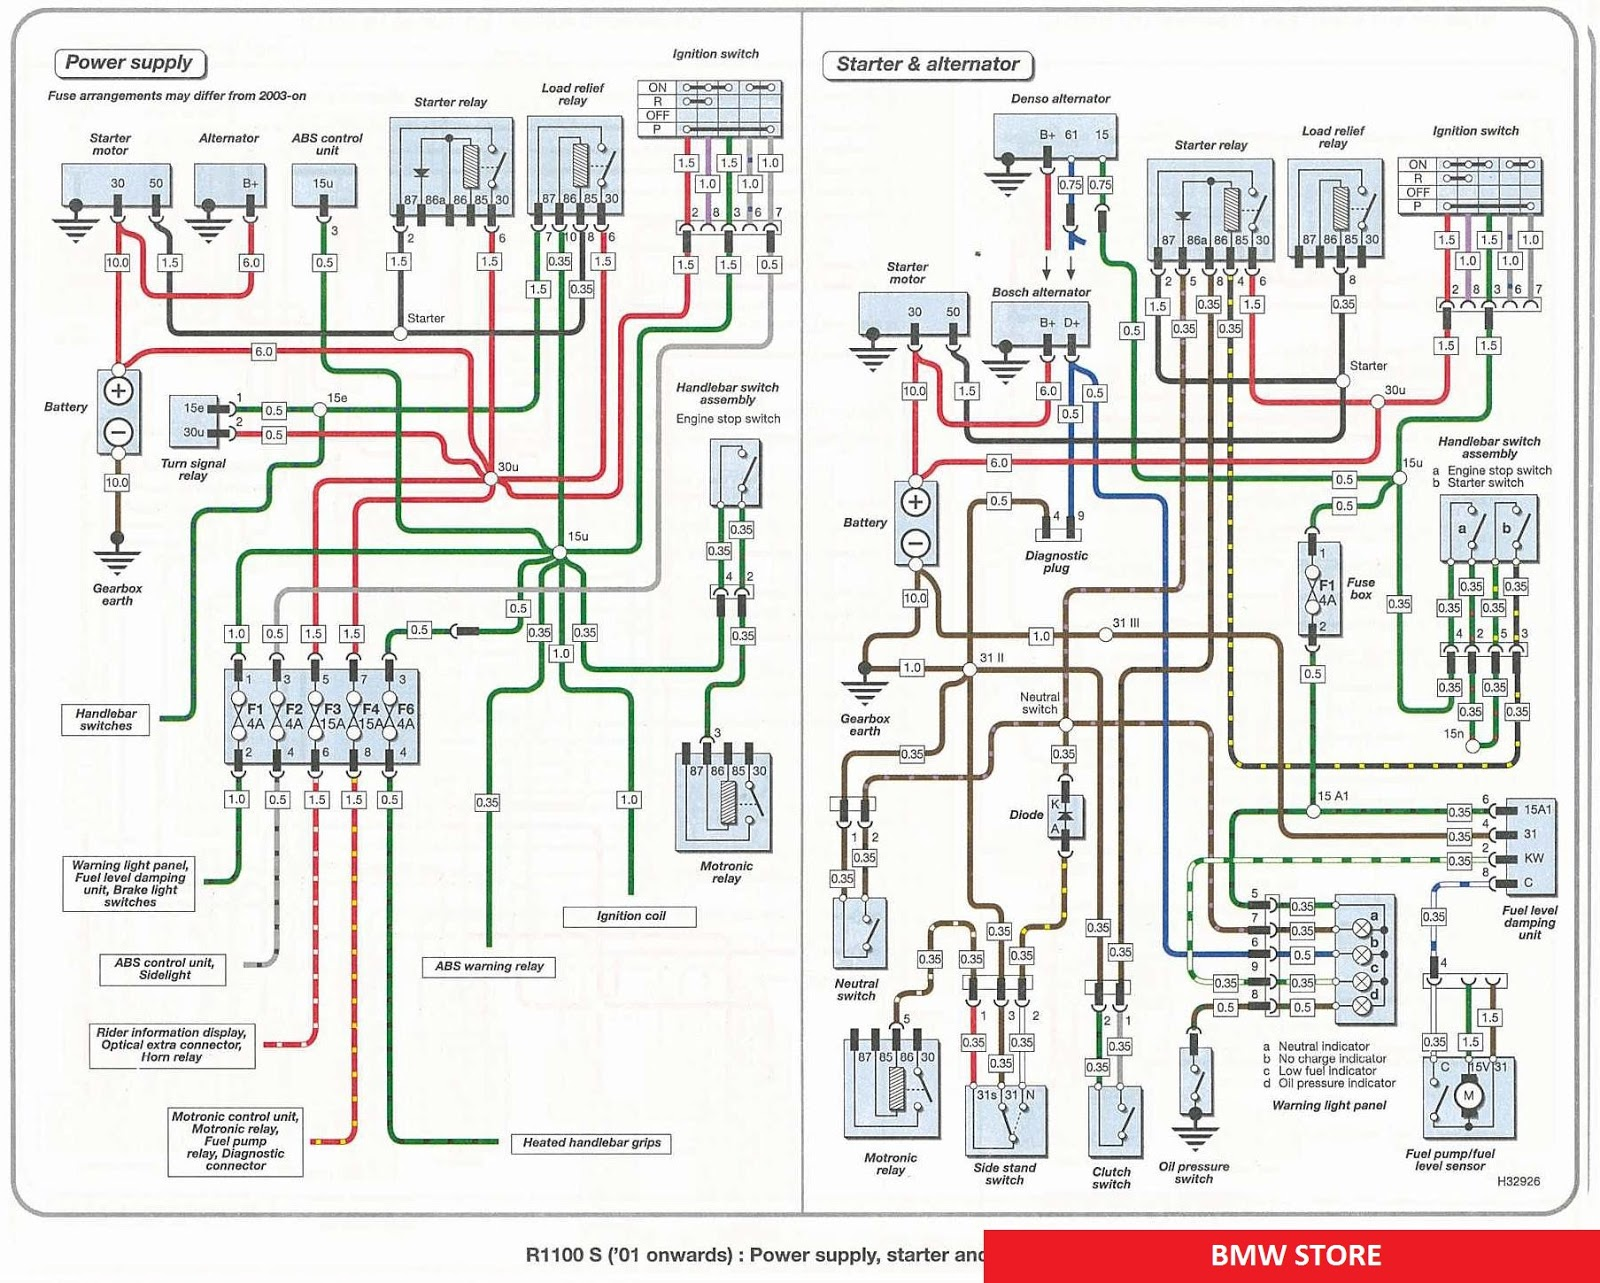 hight resolution of bmw r1150r wiring diagram home wiring diagram bmw r1150r wiring diagram